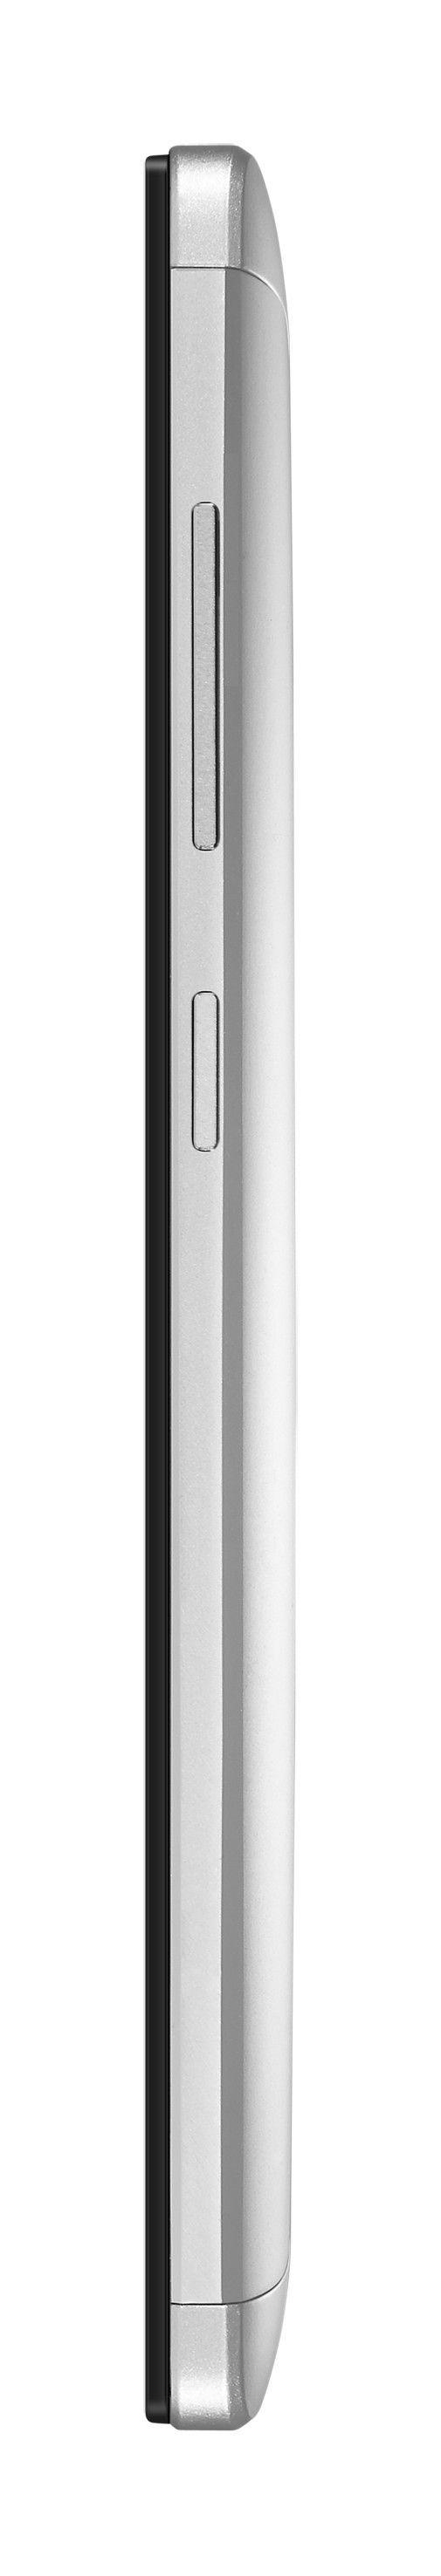 Мобильный телефон Lenovo VIBE P1 Pro Silver - 5